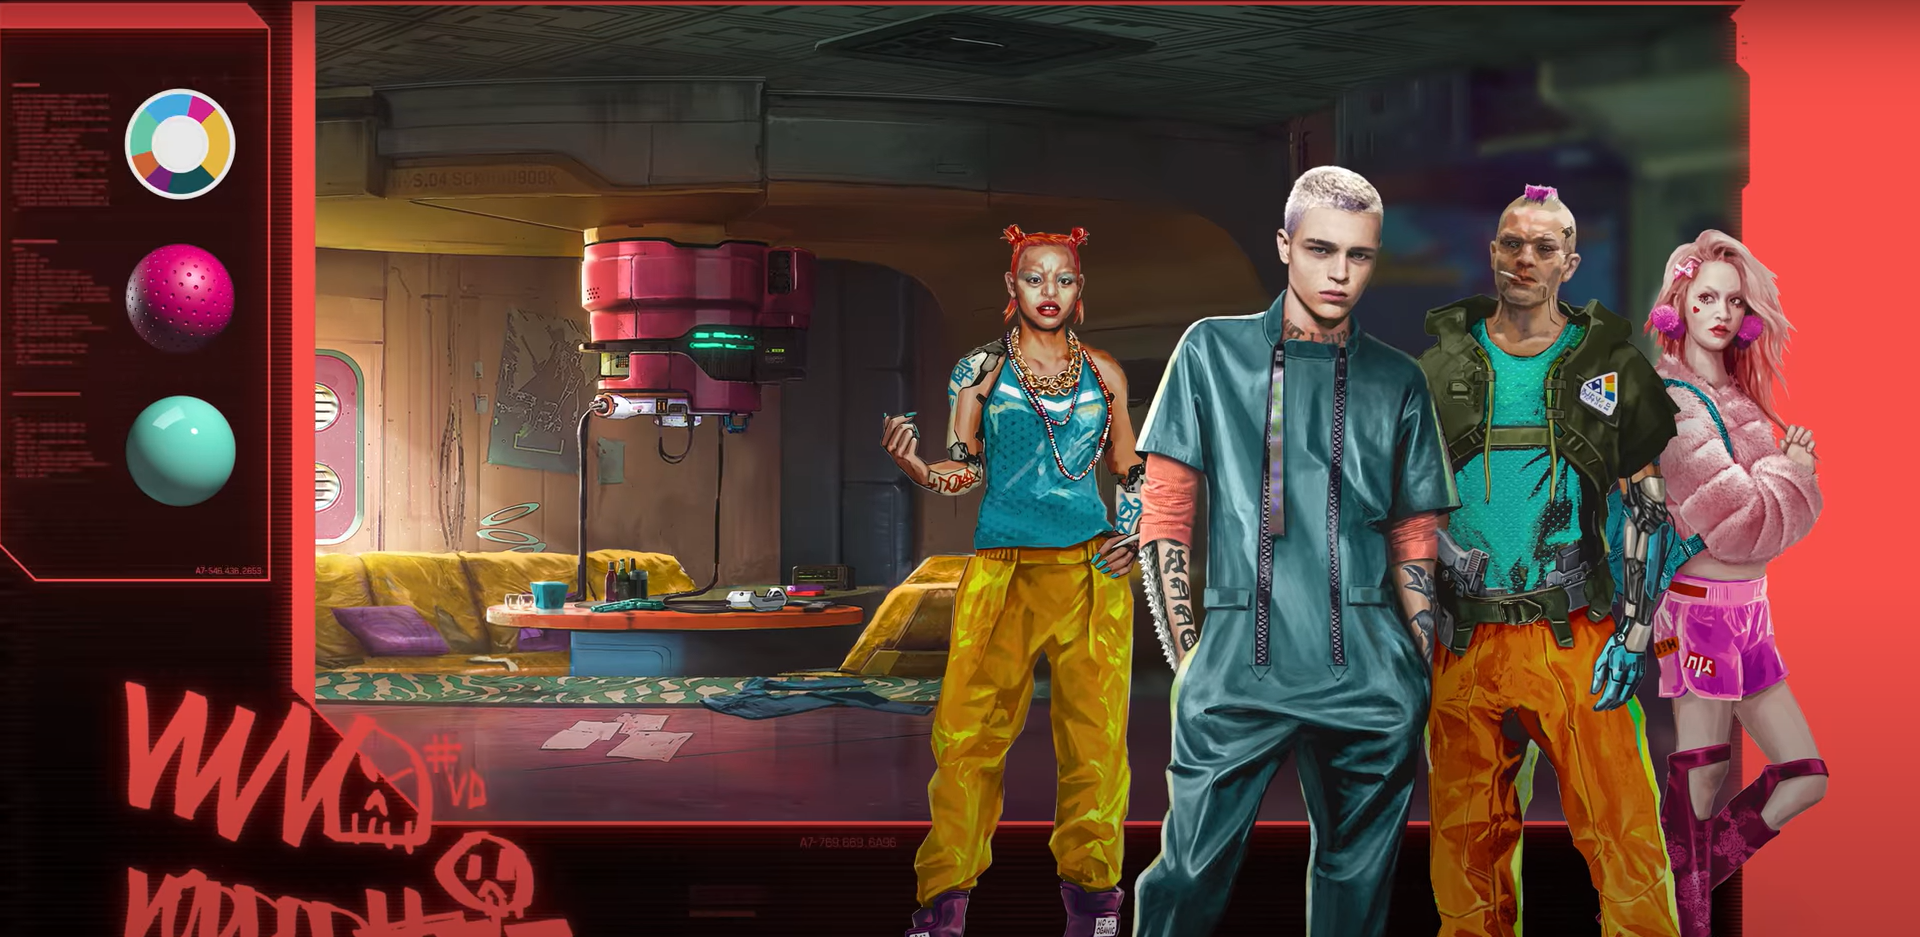 Cyberpunk 2077 kıyafet